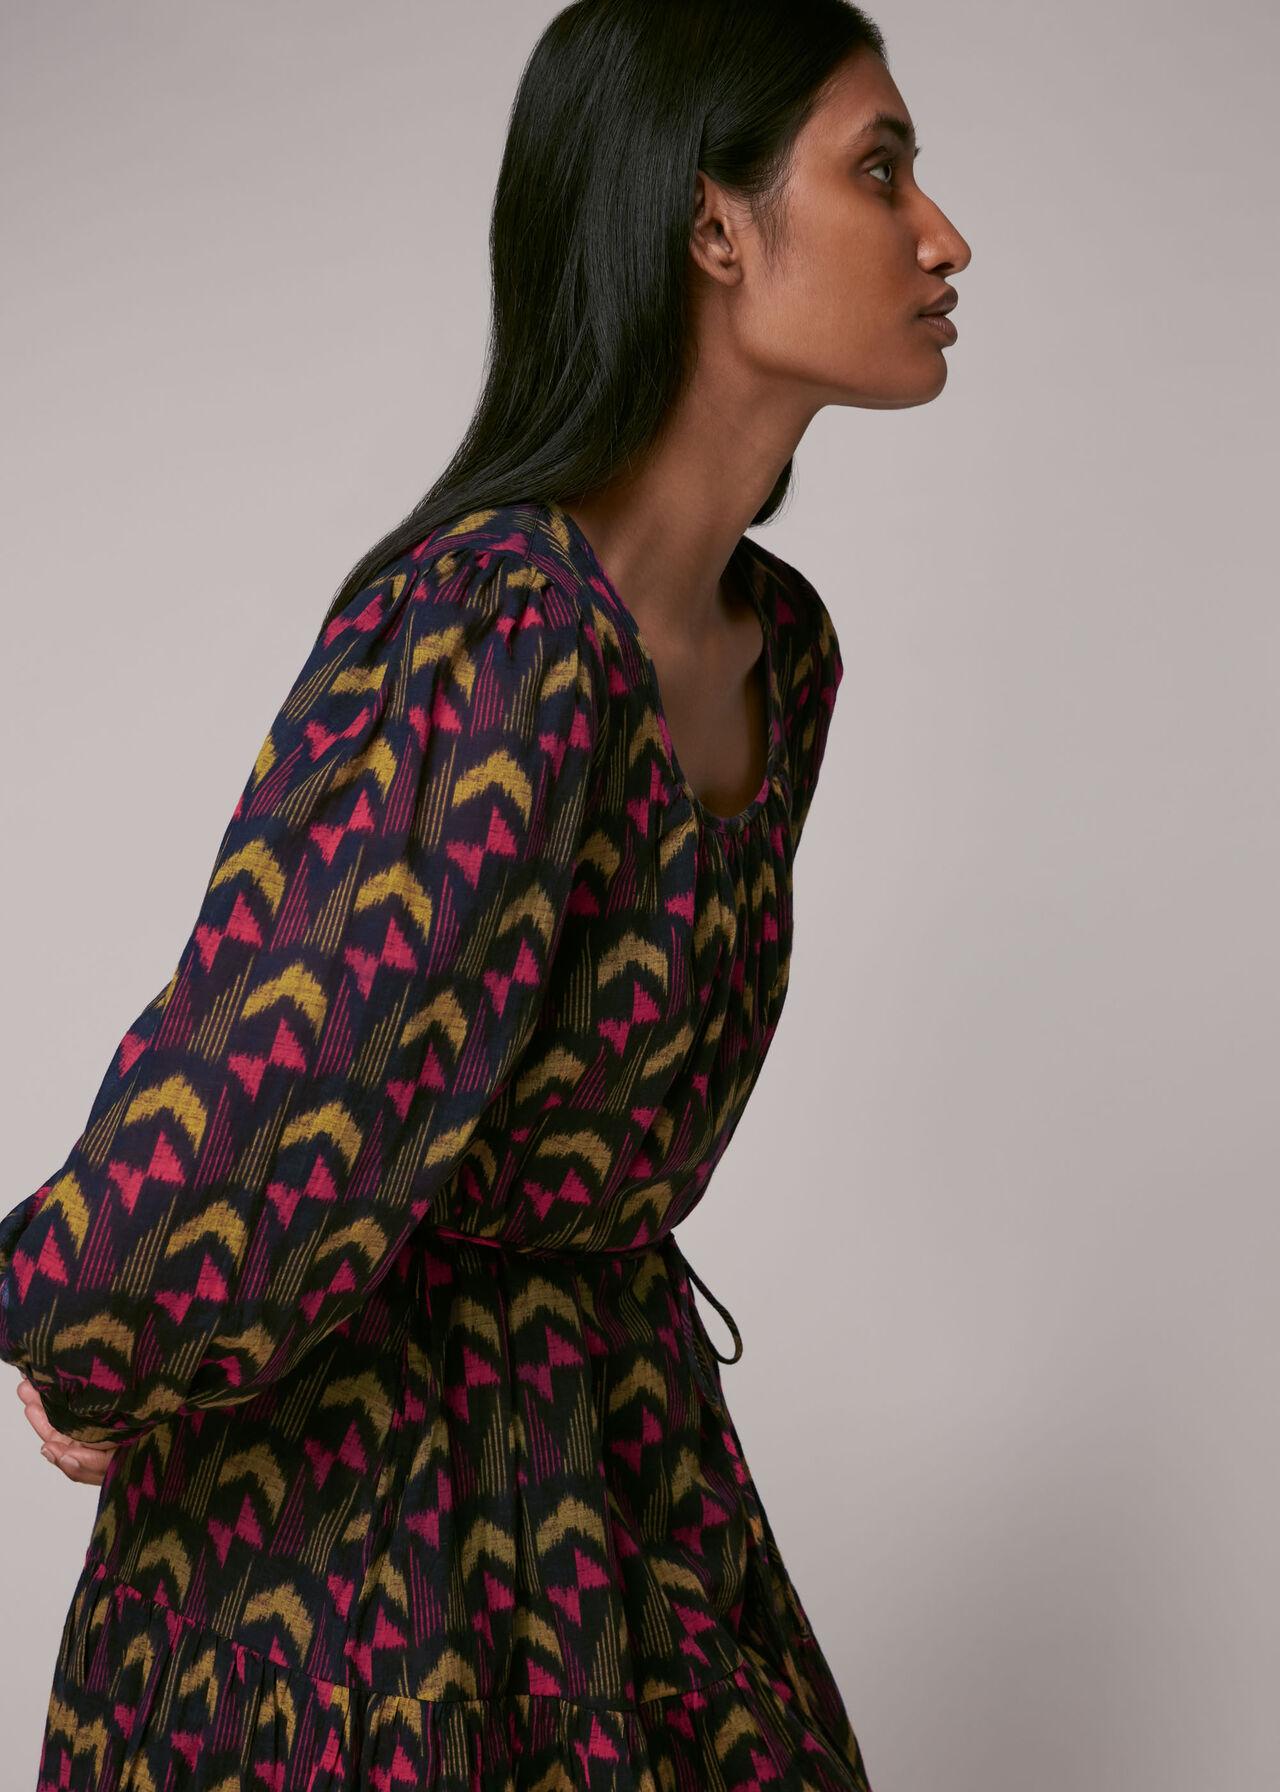 Geometric Ikat Trapeze Dress